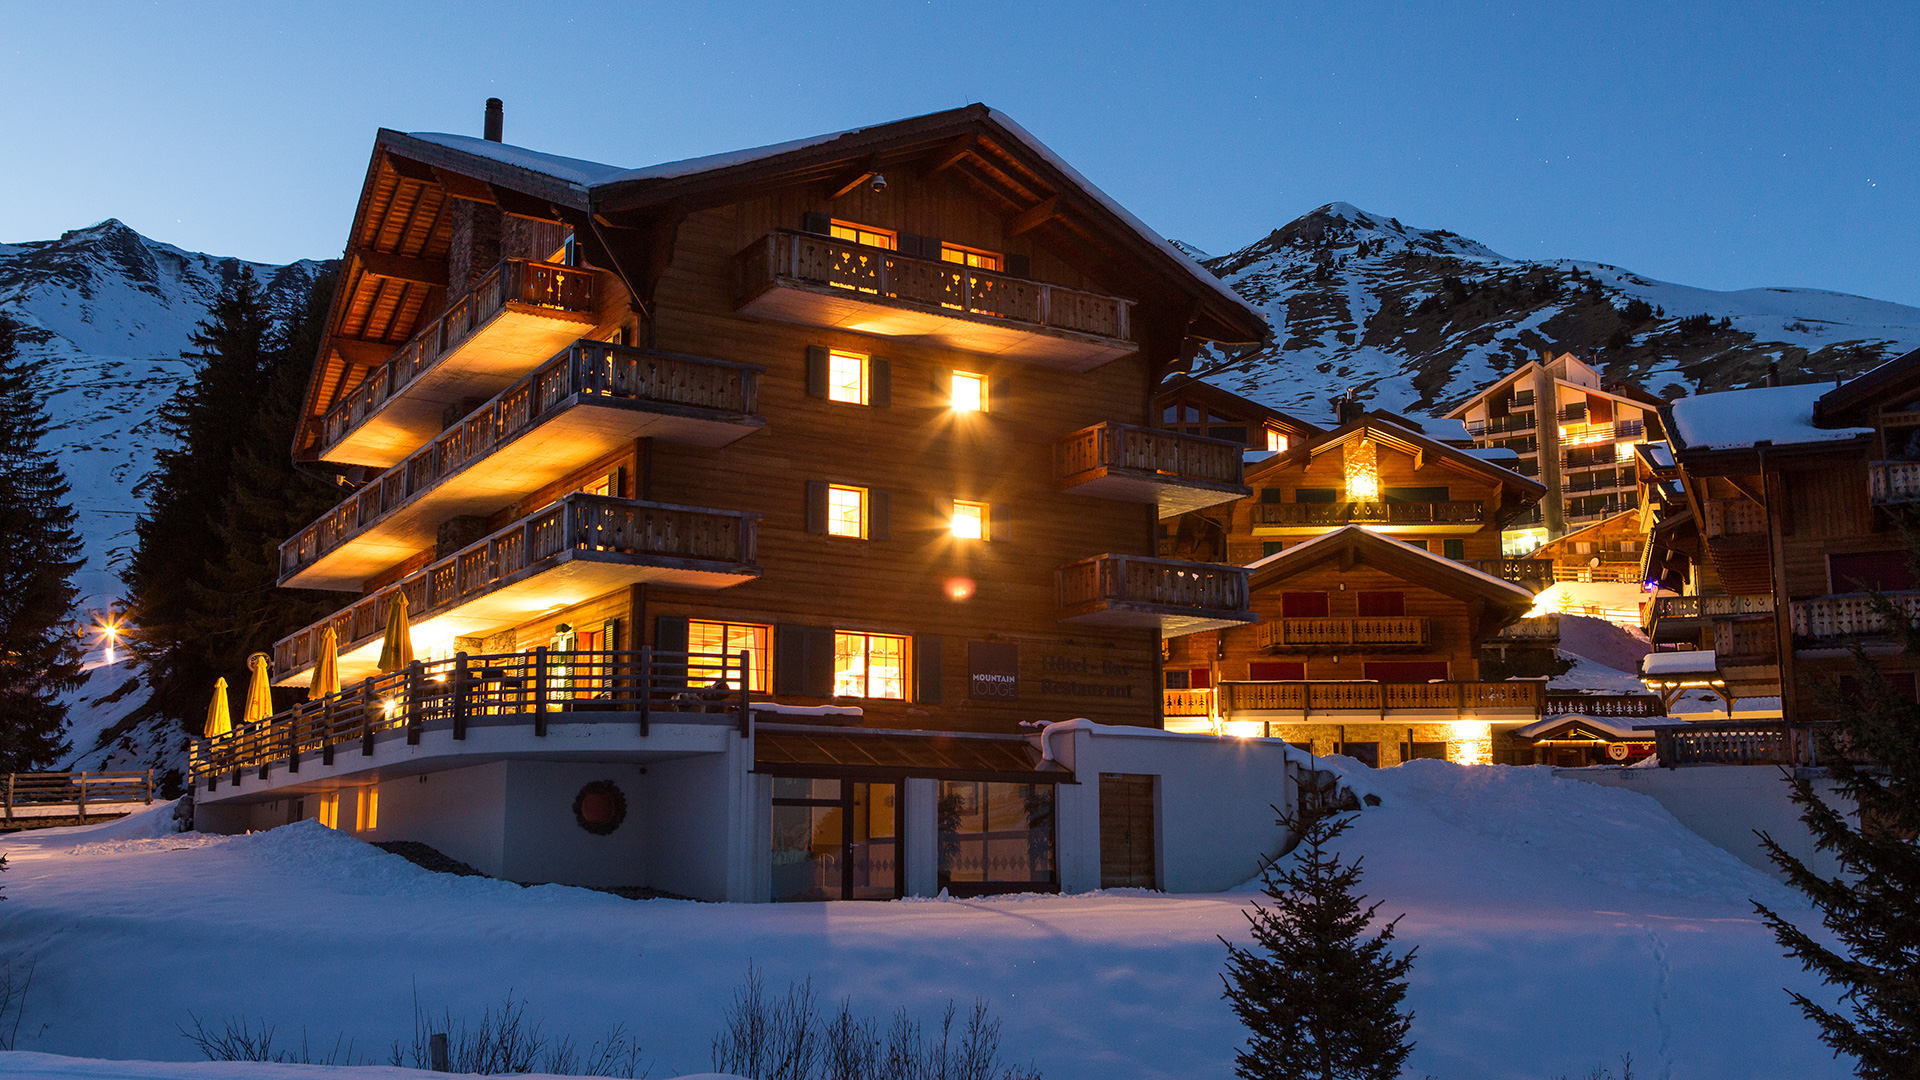 Mountain Lodge Hotel, Switzerland